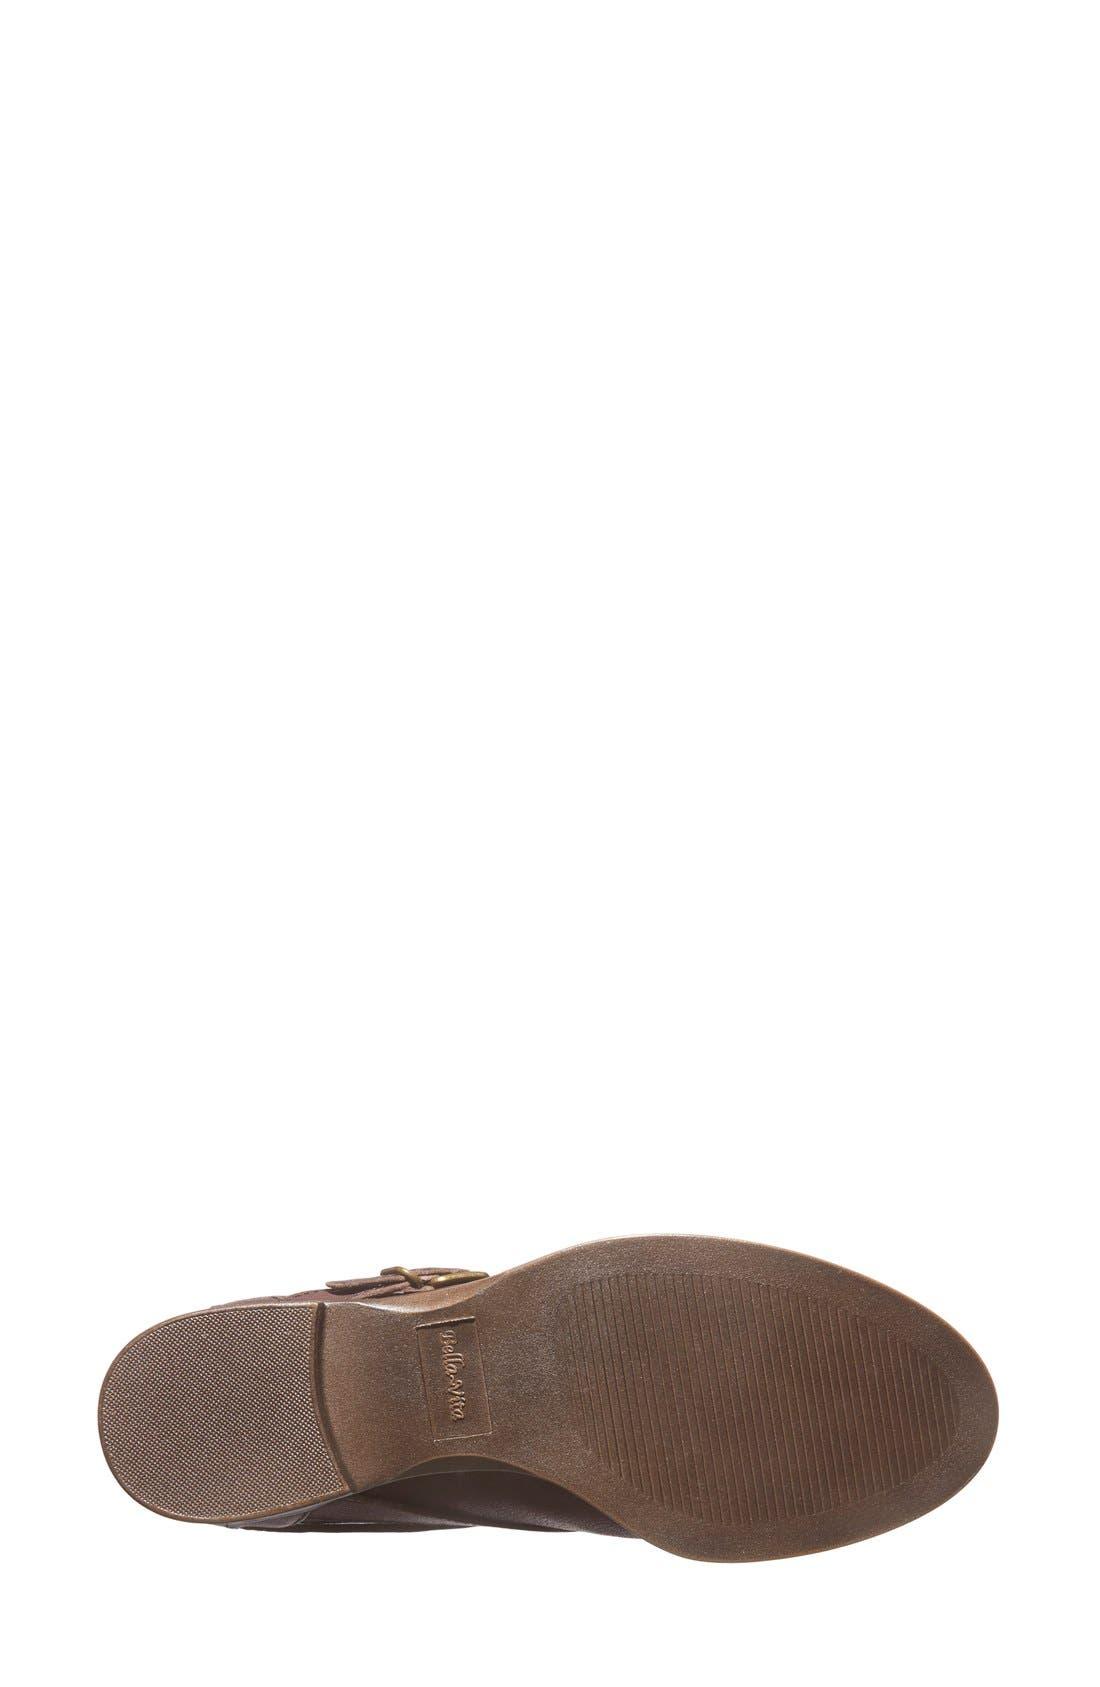 'Ronan' Buckle Leather Bootie,                             Alternate thumbnail 16, color,